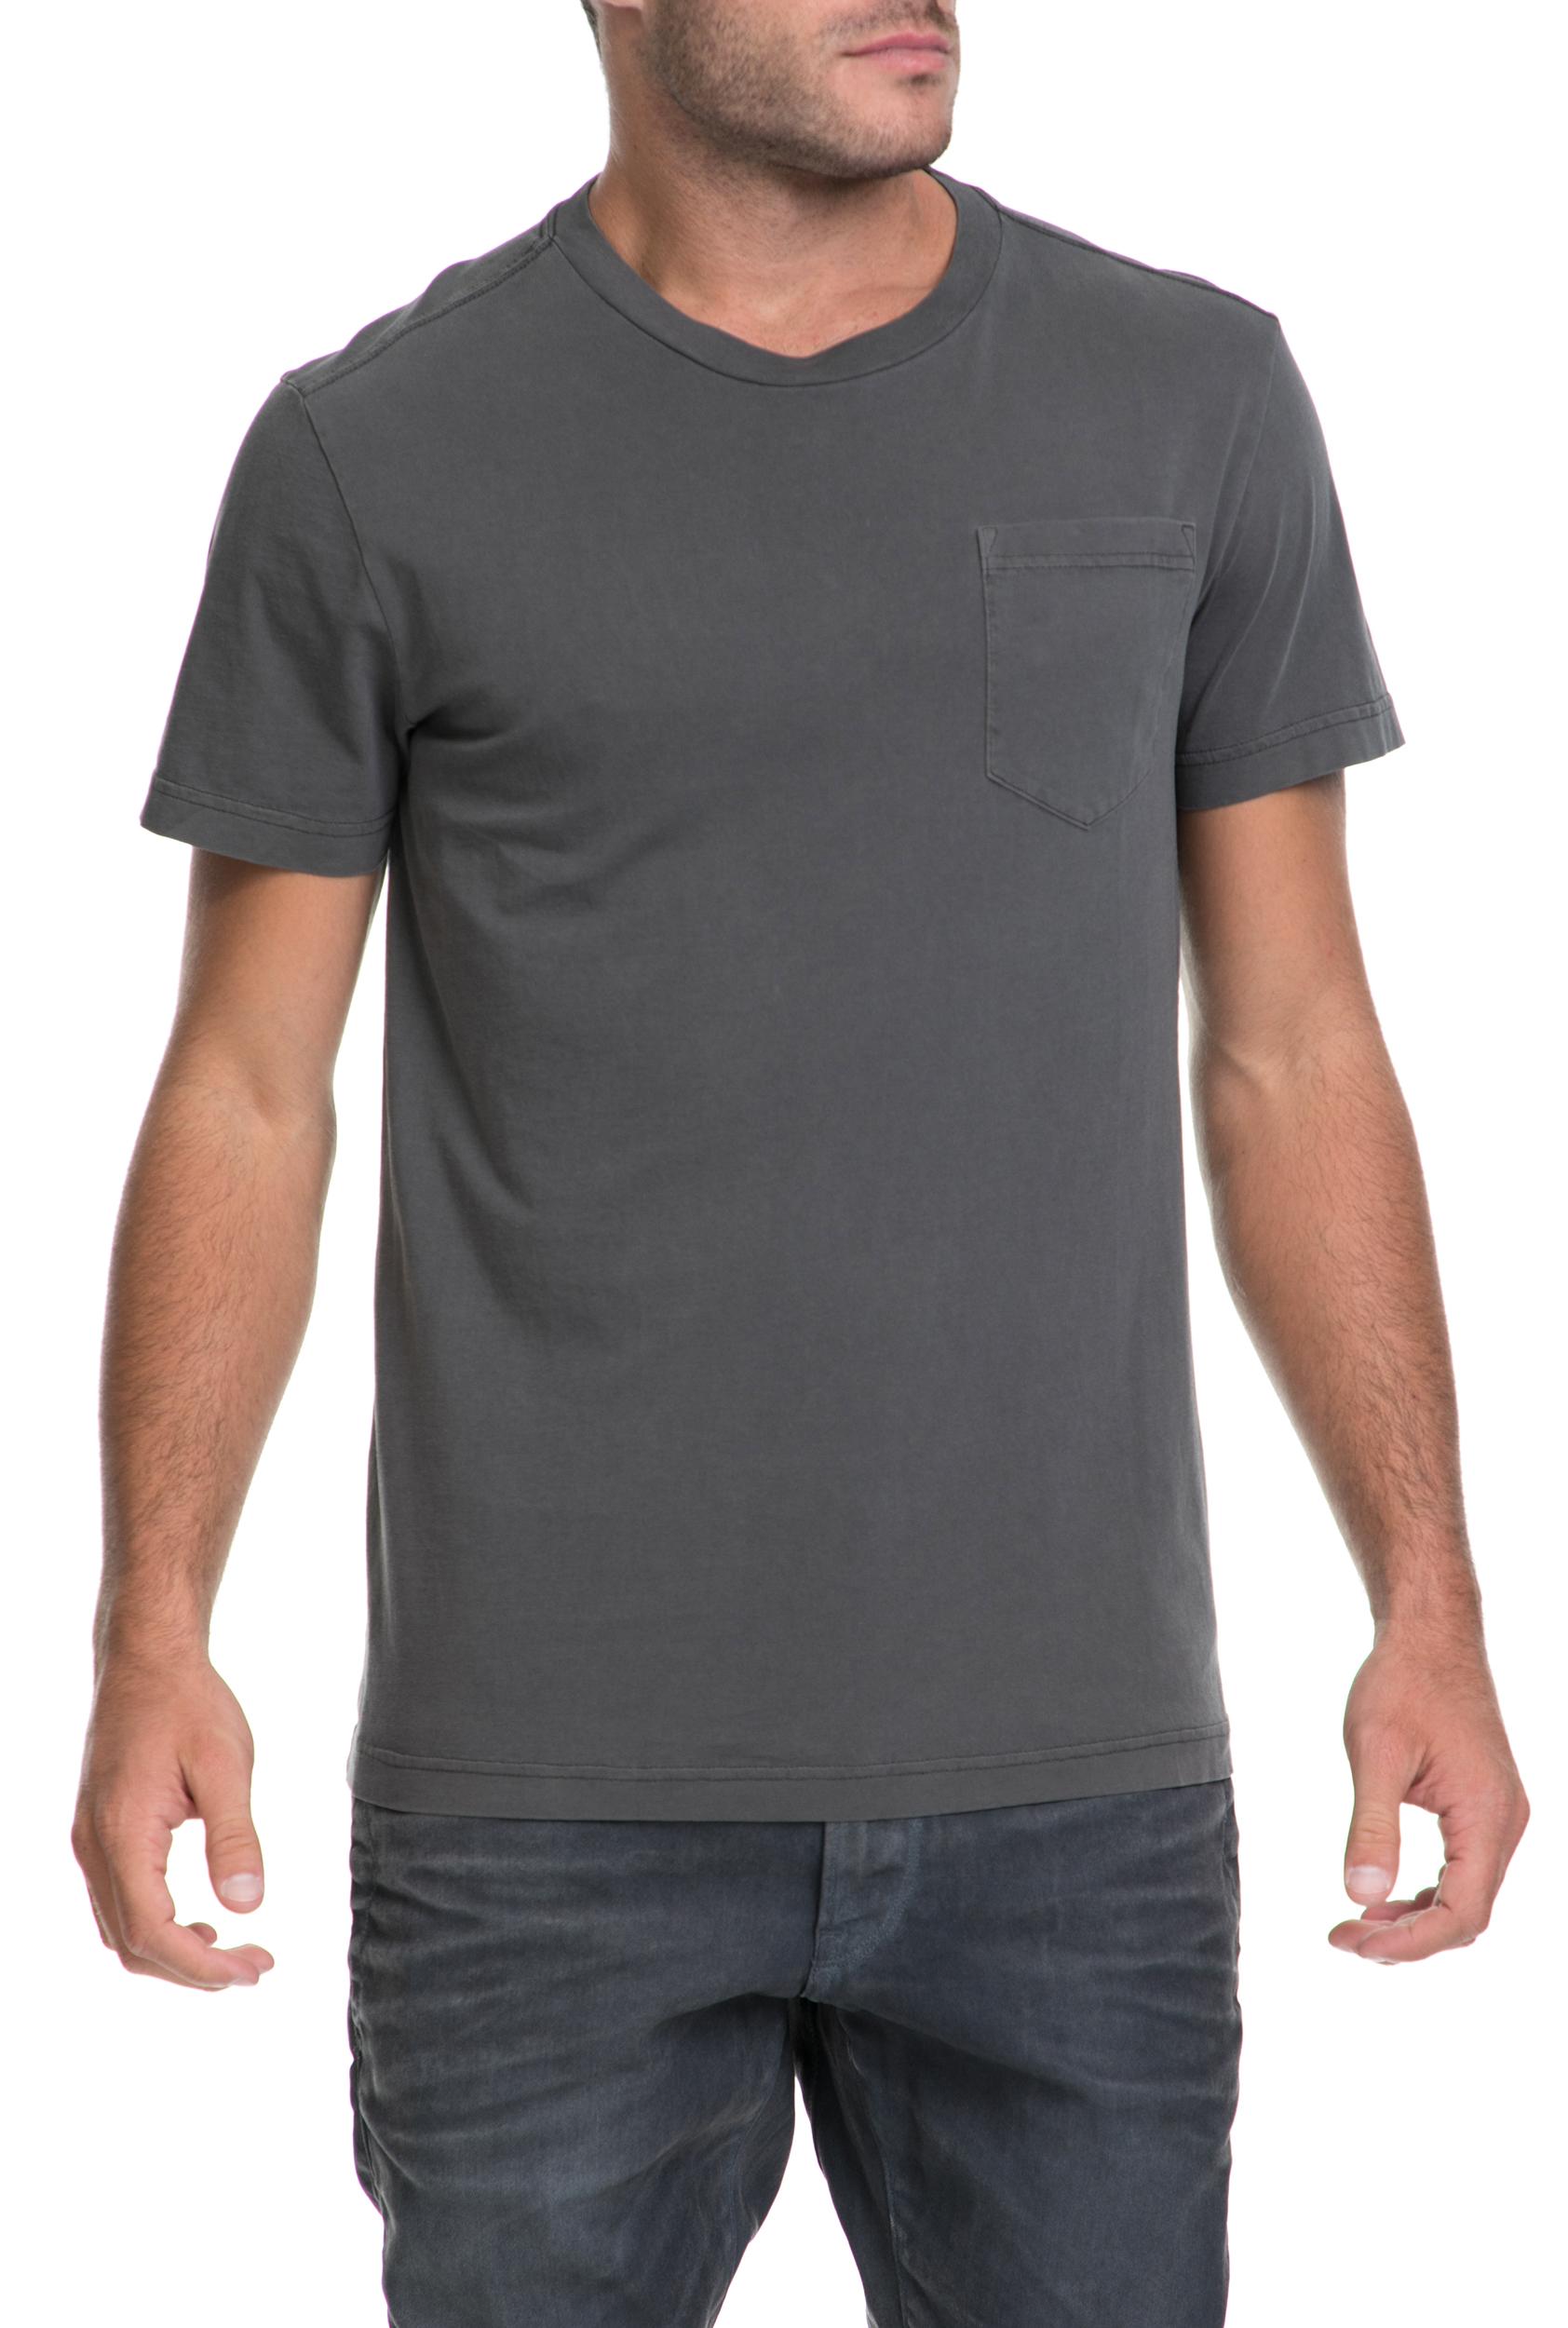 G-STAR - Αντρική μπλούζα Classic pocket G-STAR RAW γκρι ανδρικά ρούχα μπλούζες κοντομάνικες